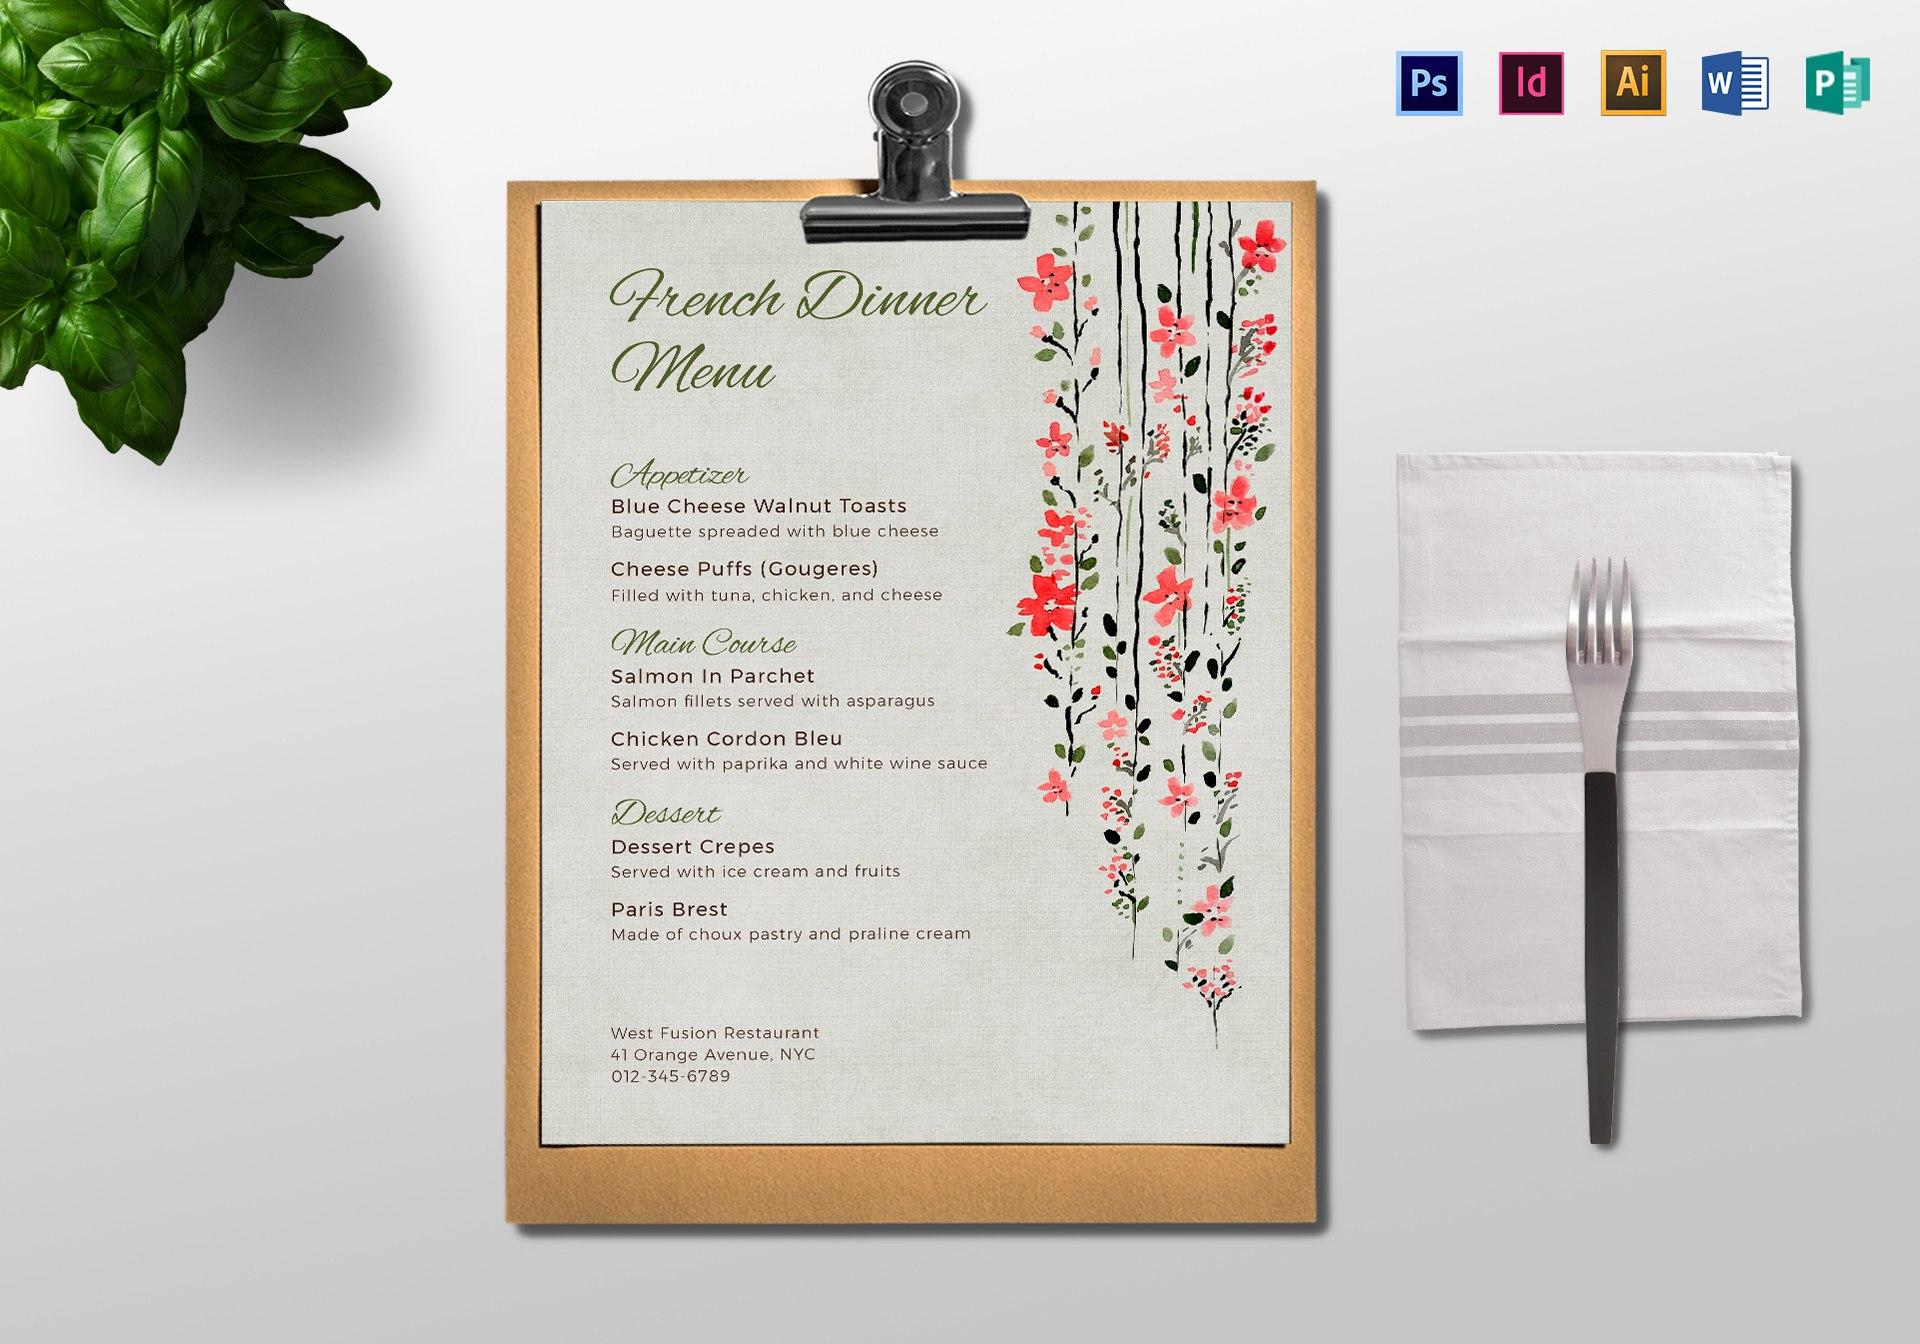 Dinner Menu Template With Regard To Product Menu Template